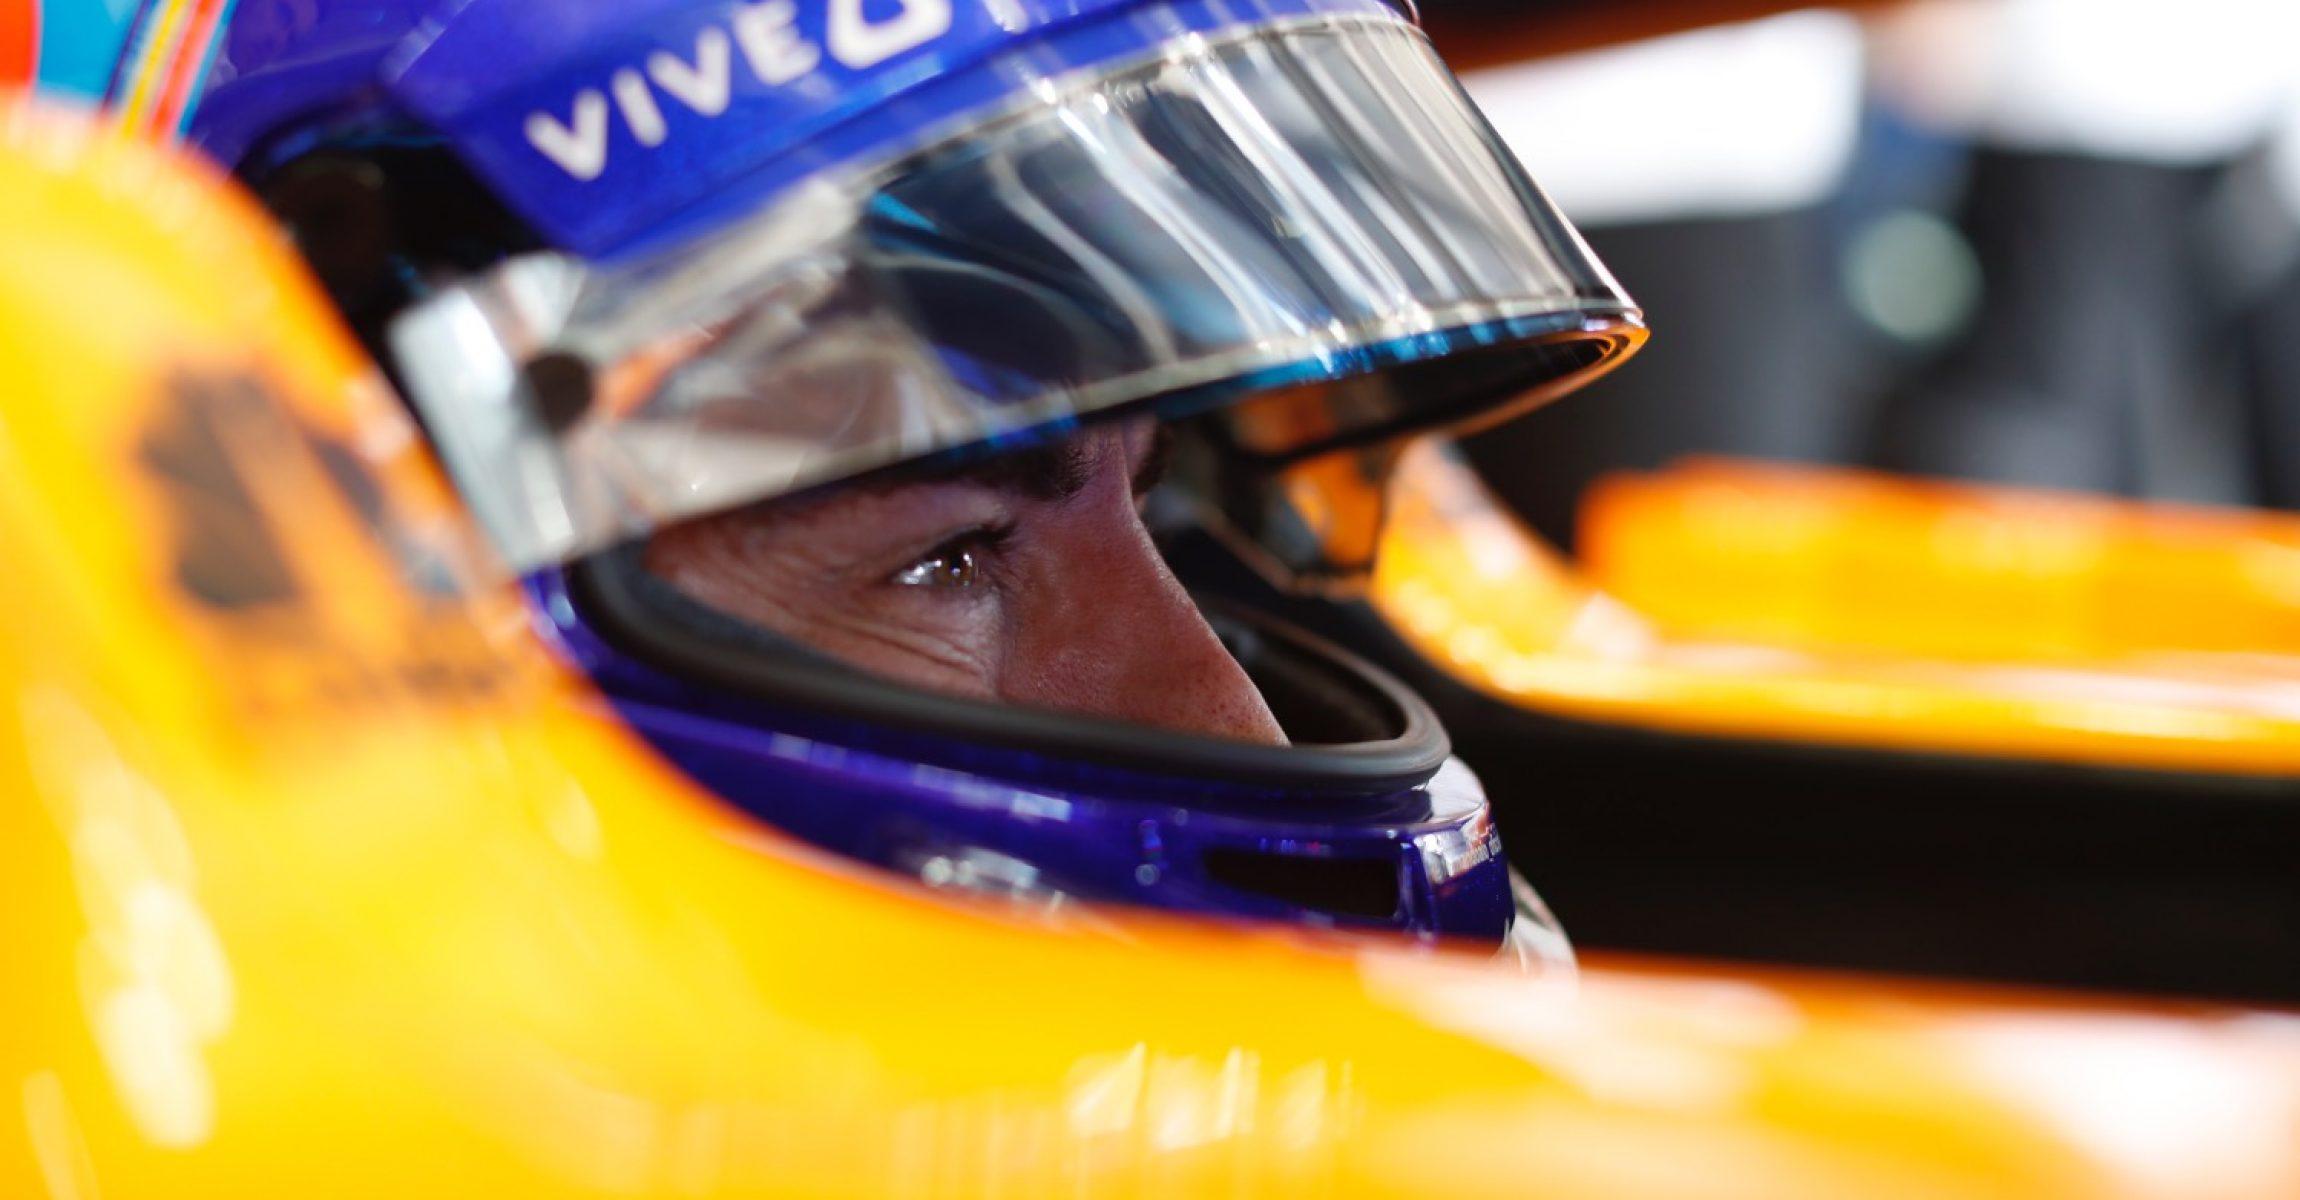 Hockenheimring, Hockenheim, Germany Friday 20 July 2018. Fernando Alonso, McLaren, in his cockpit. Photo: Steven Tee/McLaren ref: Digital Image _2ST0087